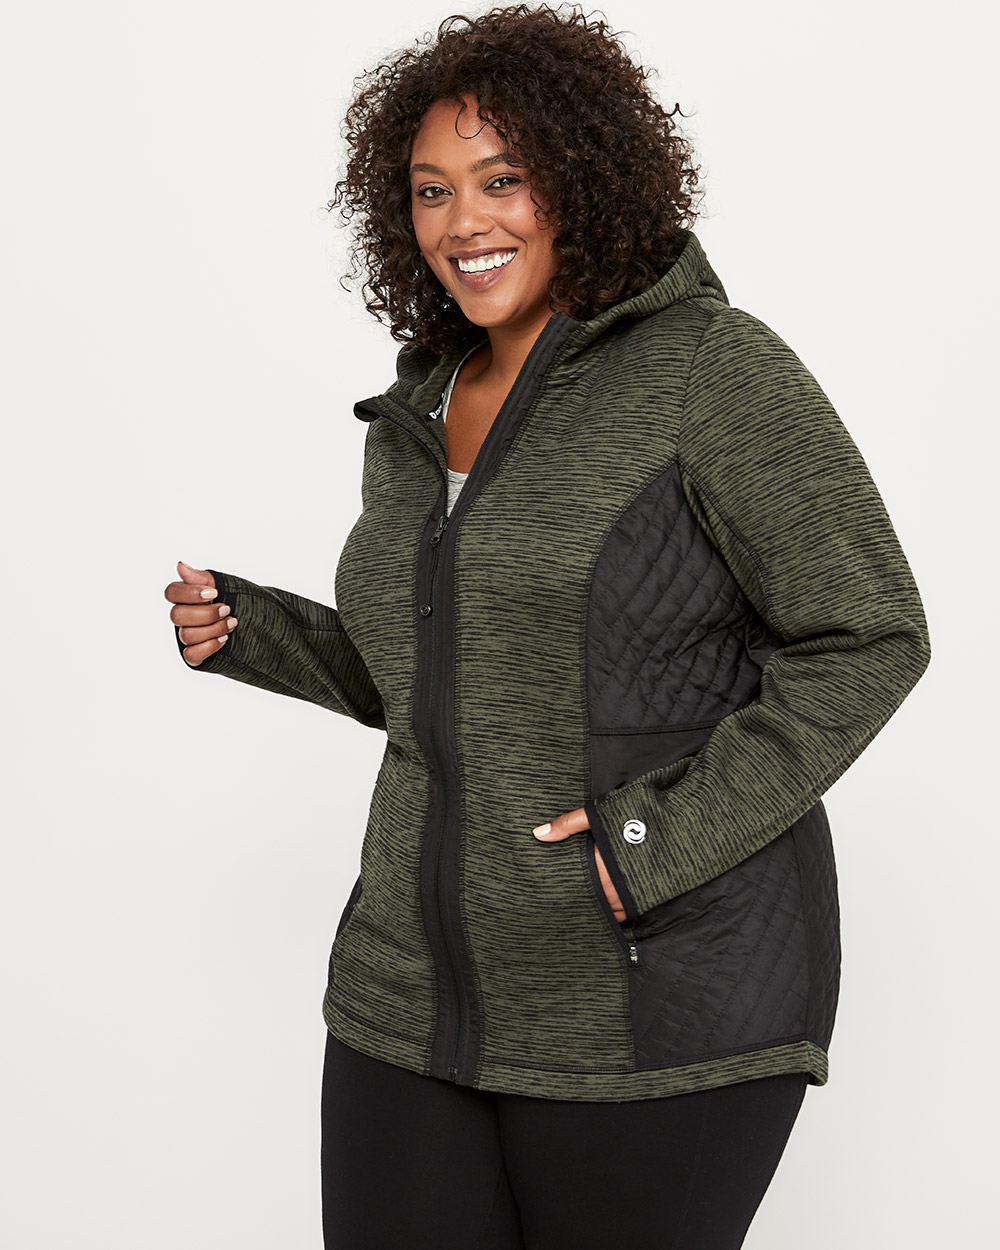 cd9218639e3 Lyst - Addition Elle Plus-size Hooded Jacket - Activezone in Black